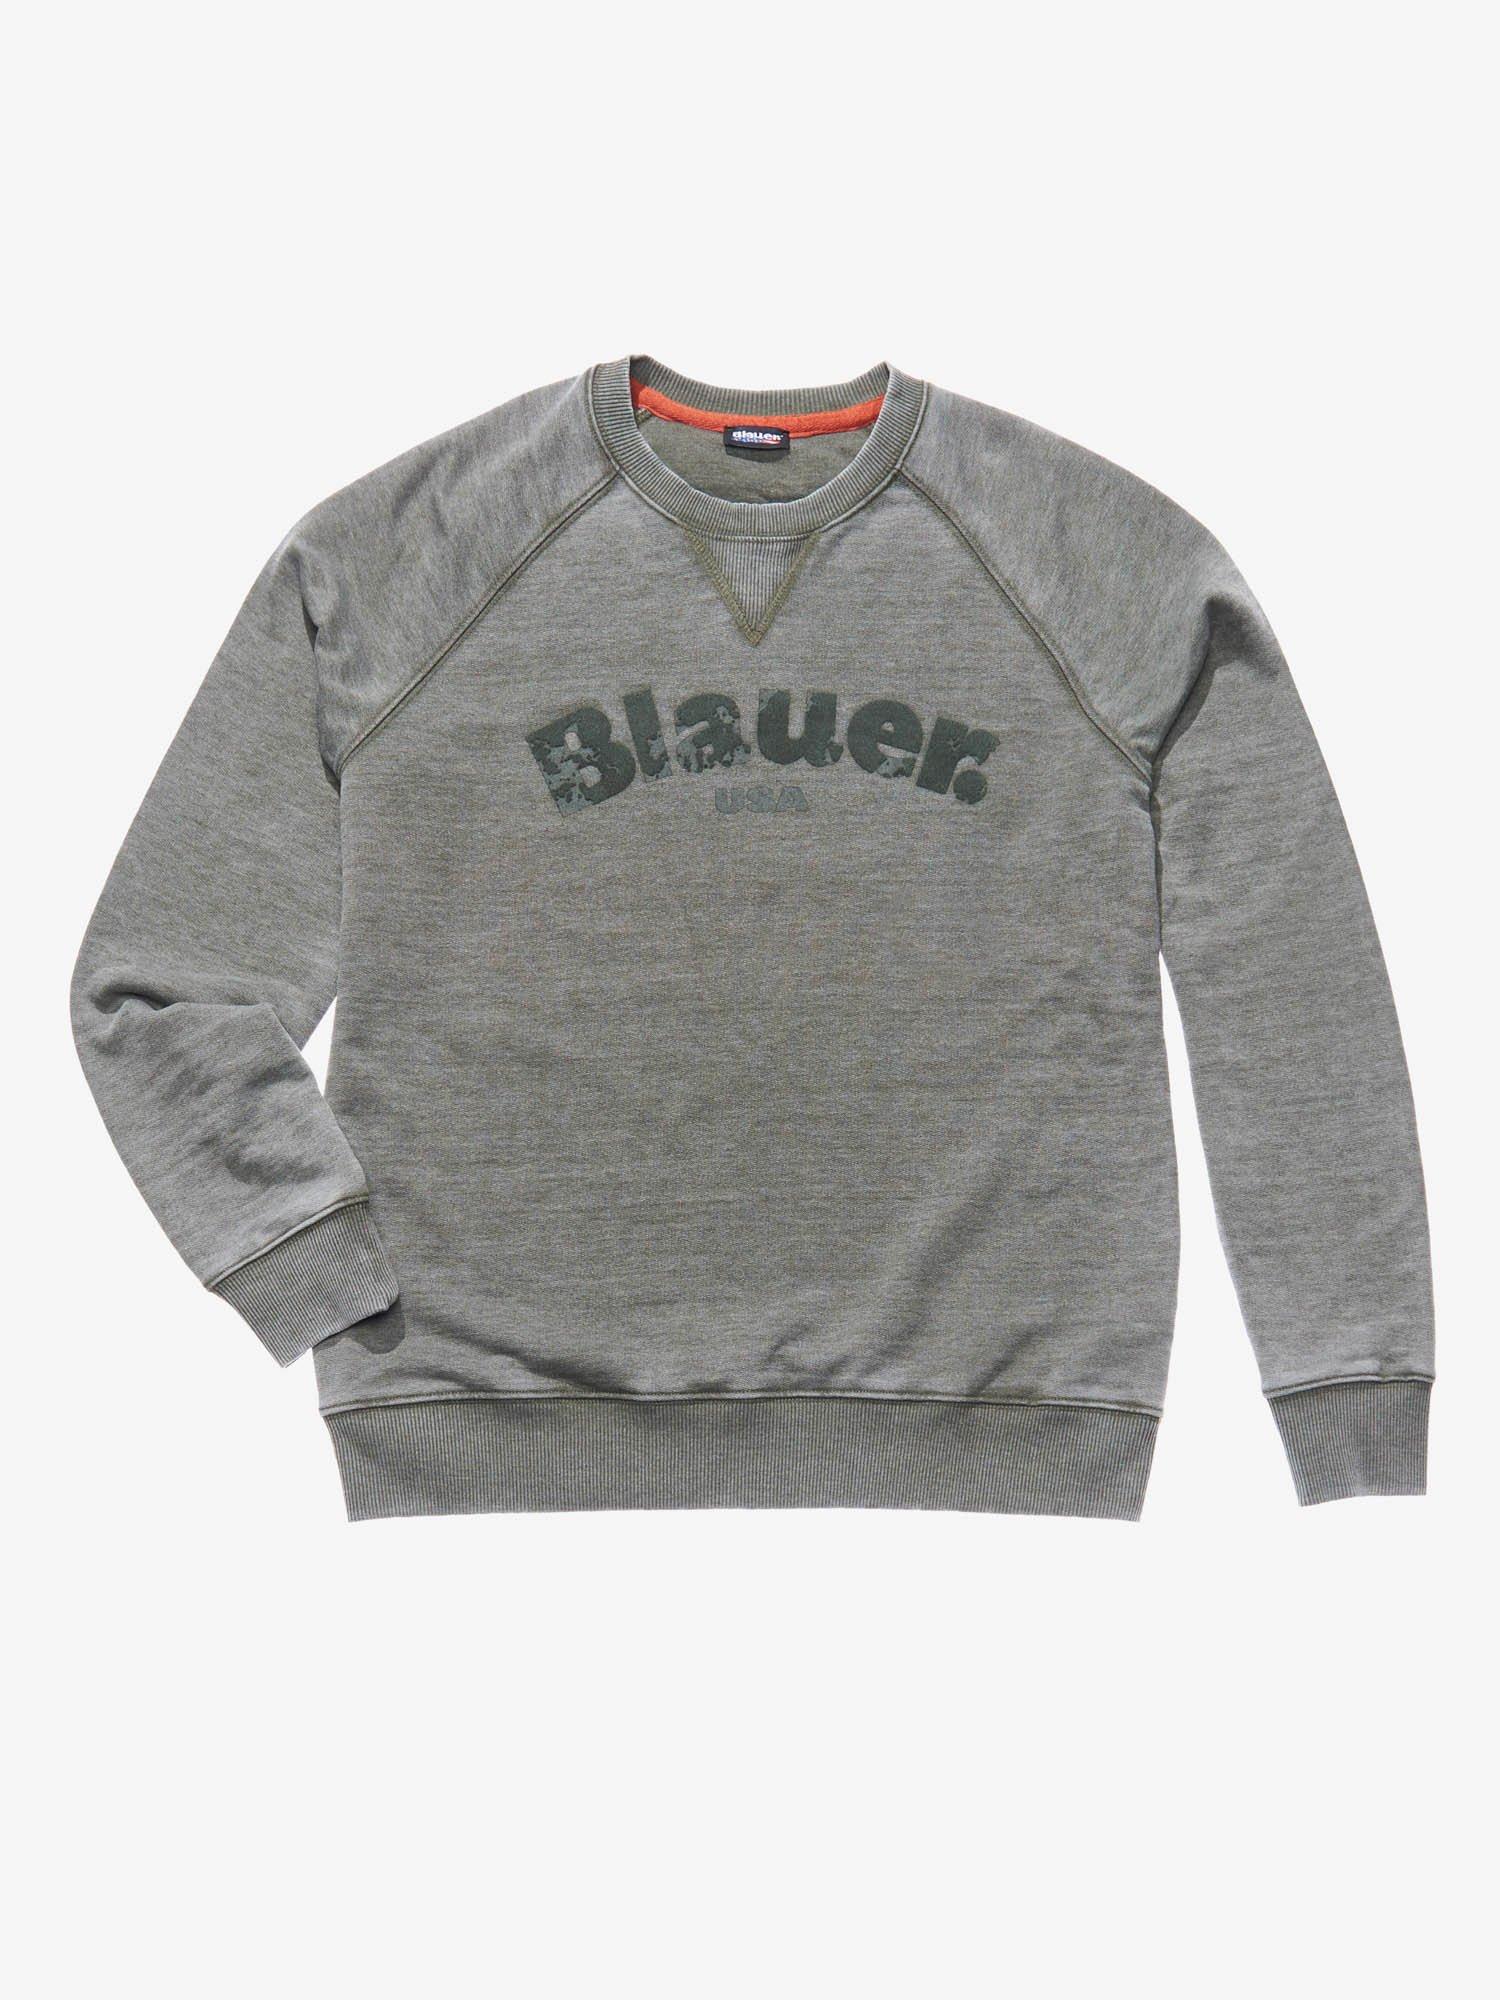 FELPA GIROCOLLO BURNOUT - Blauer